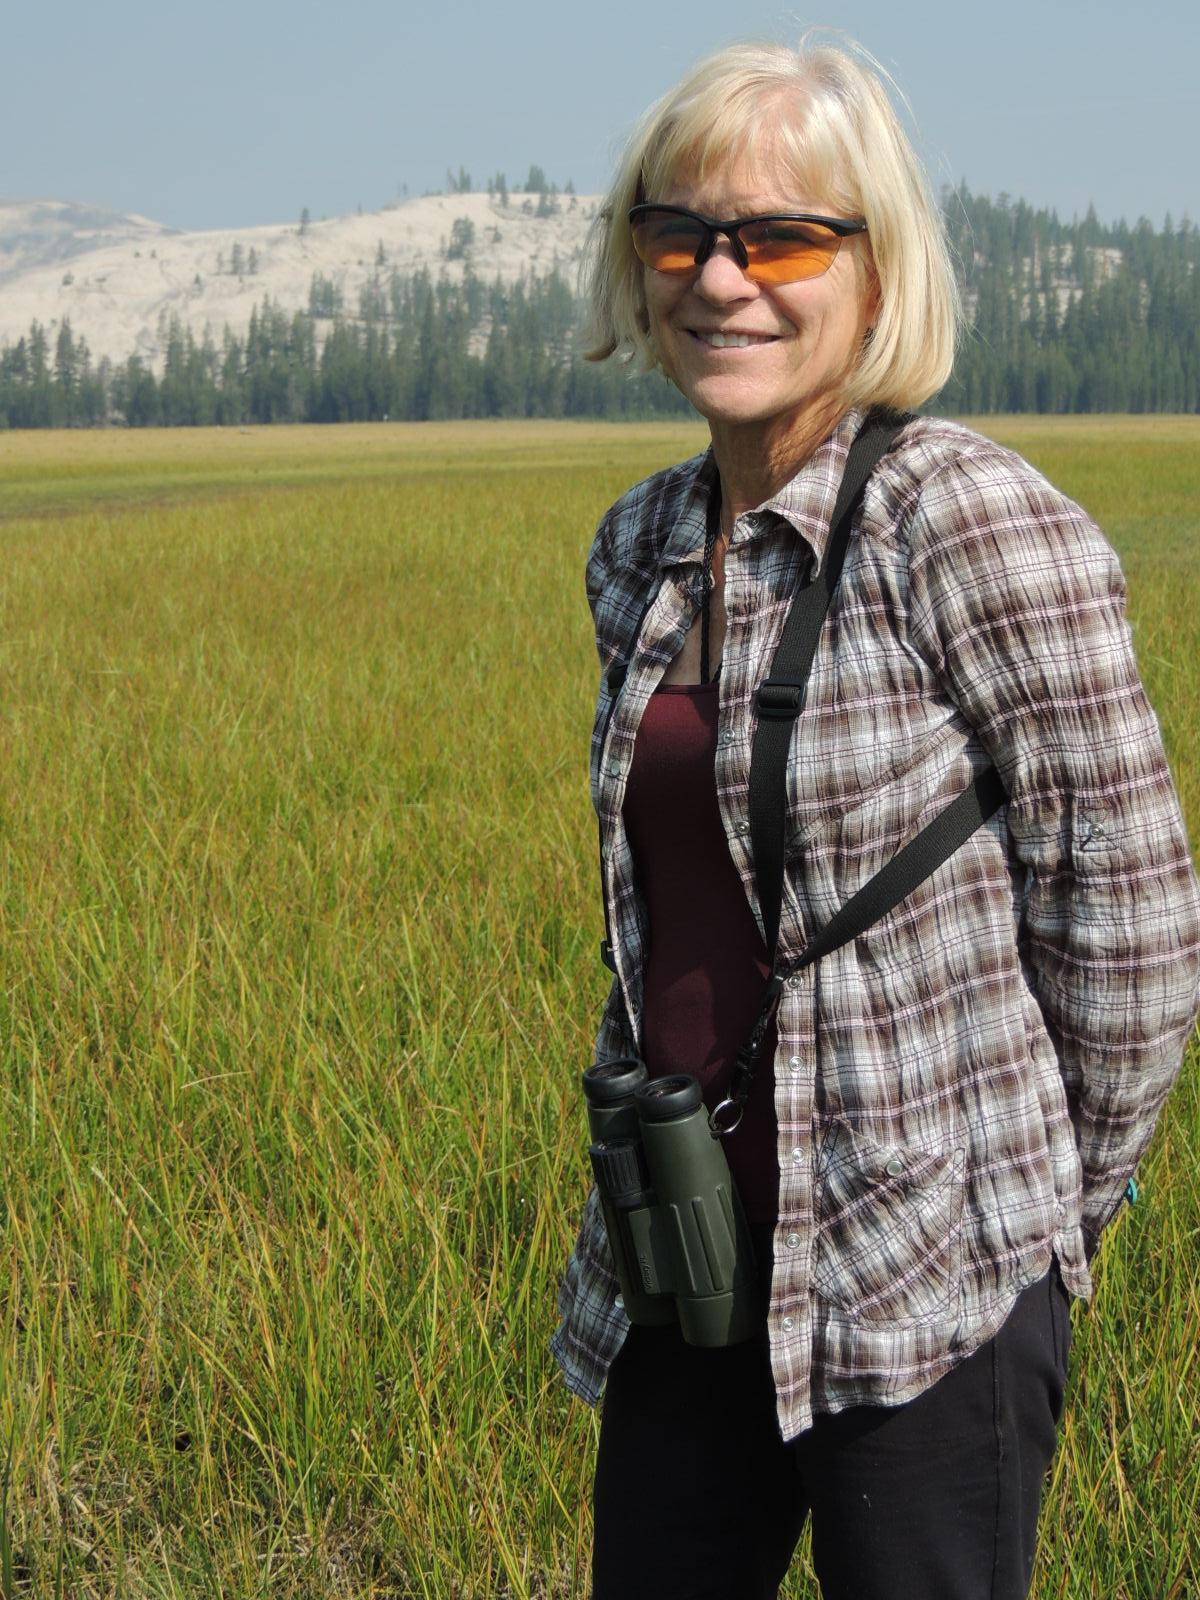 Jane Bodle Tuolumne Meadow Yosemite National Park